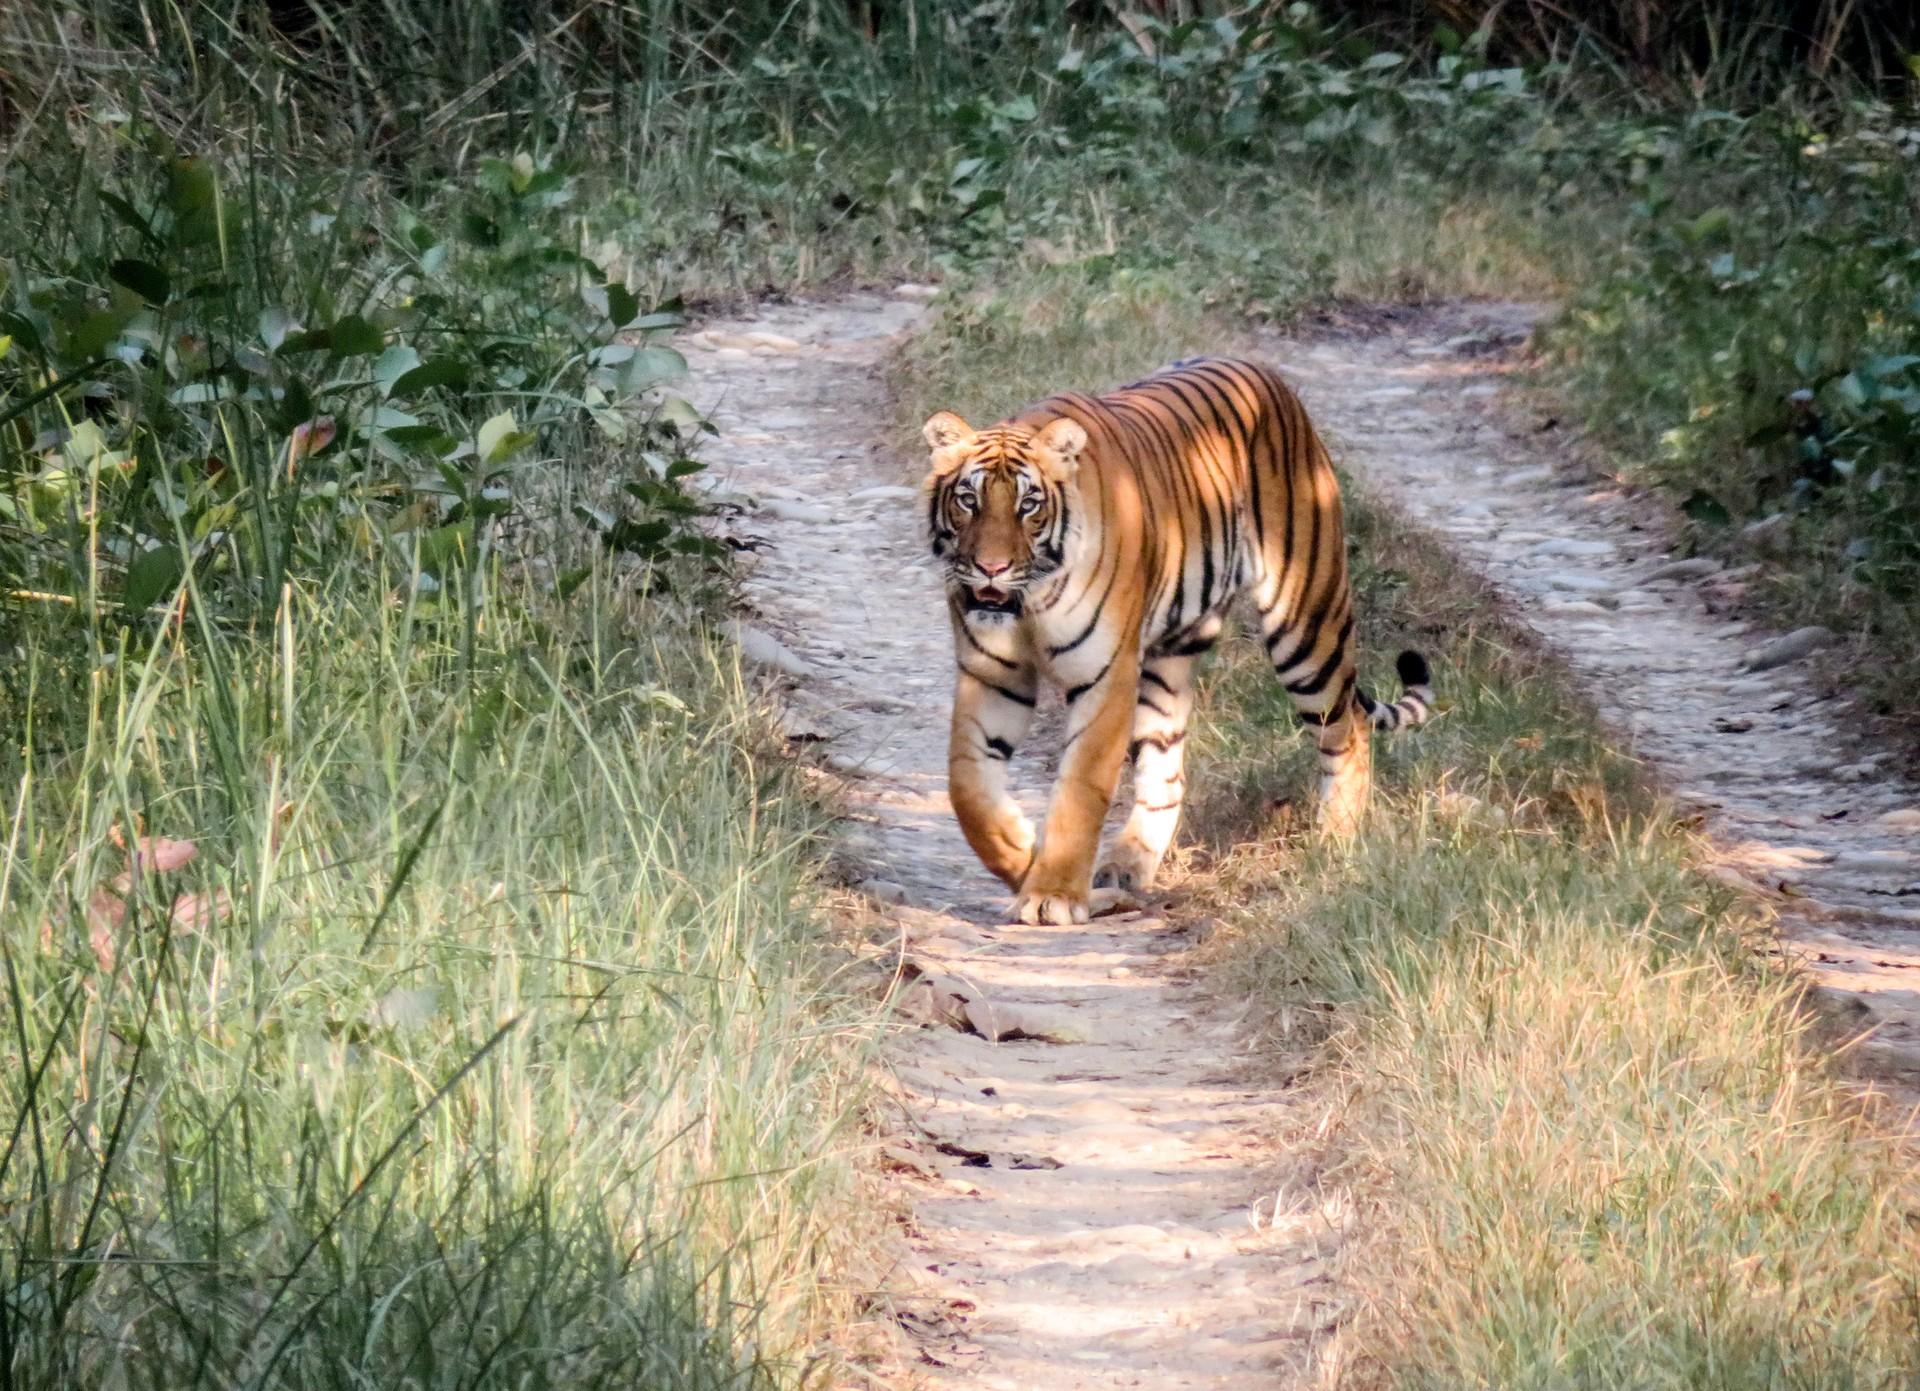 Bengal tiger in Chitwan National Park, Nepal